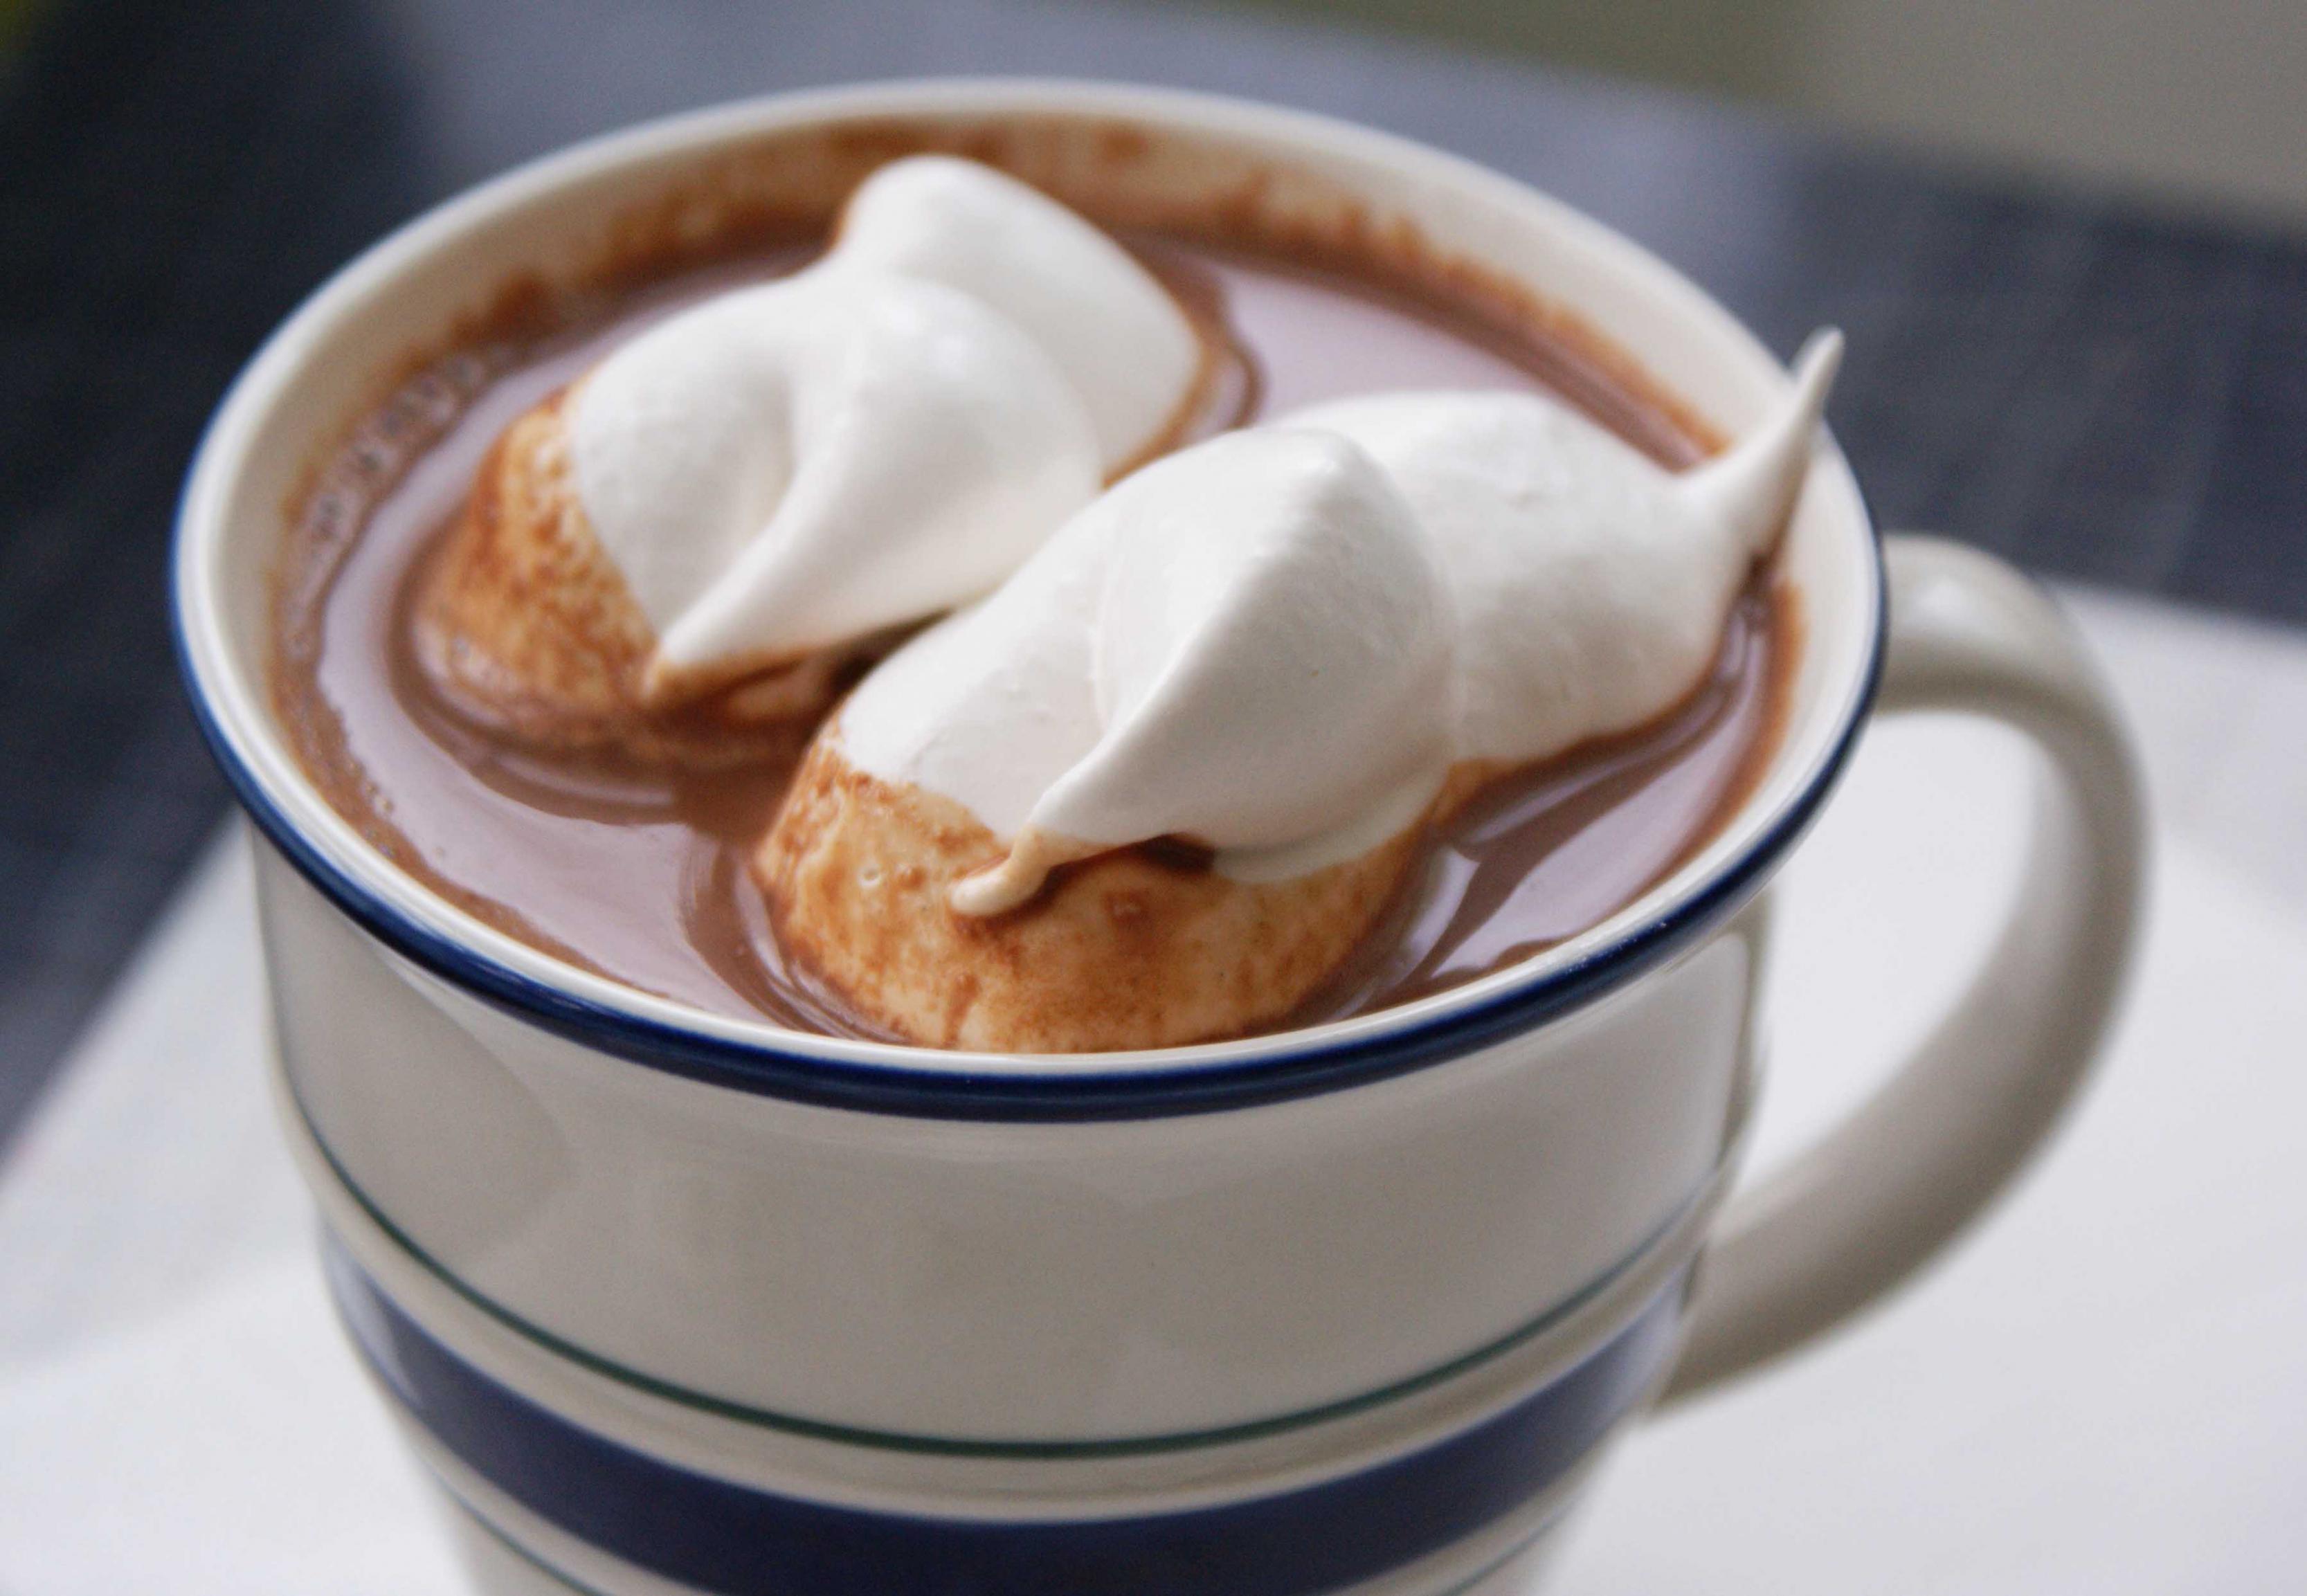 https://www.thaqafnafsak.com/wp-content/uploads/2014/11/homemade-hot-chocolate-4.jpg